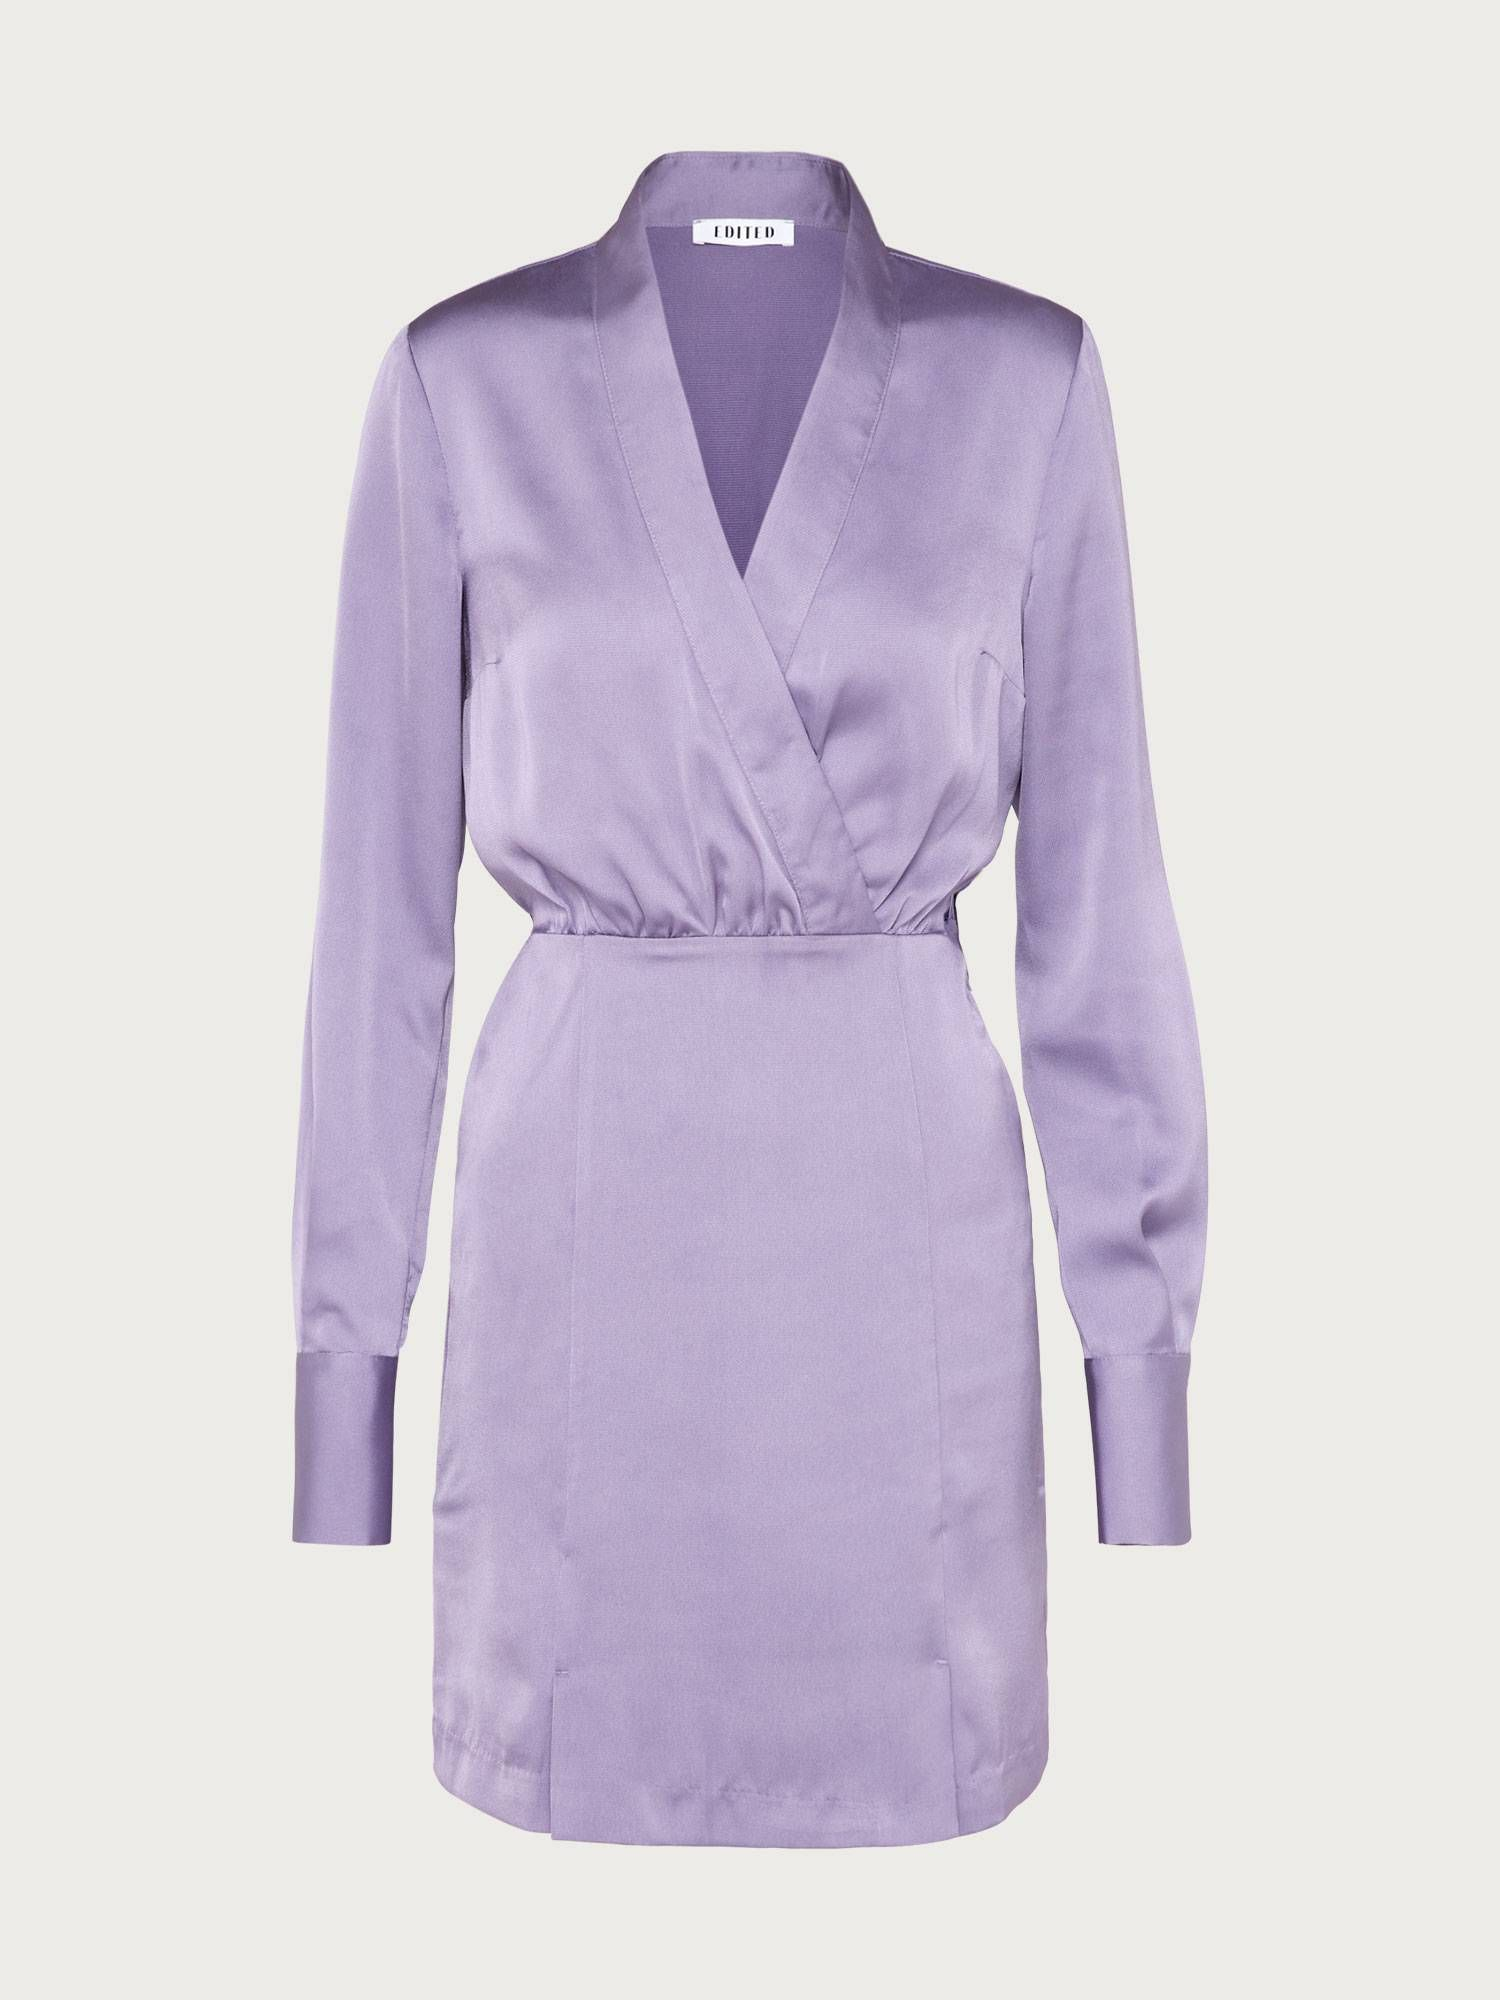 0ea1c02cbd3d Cocktail dress 'Adalia' | Click to shop it on EDITED.de ...